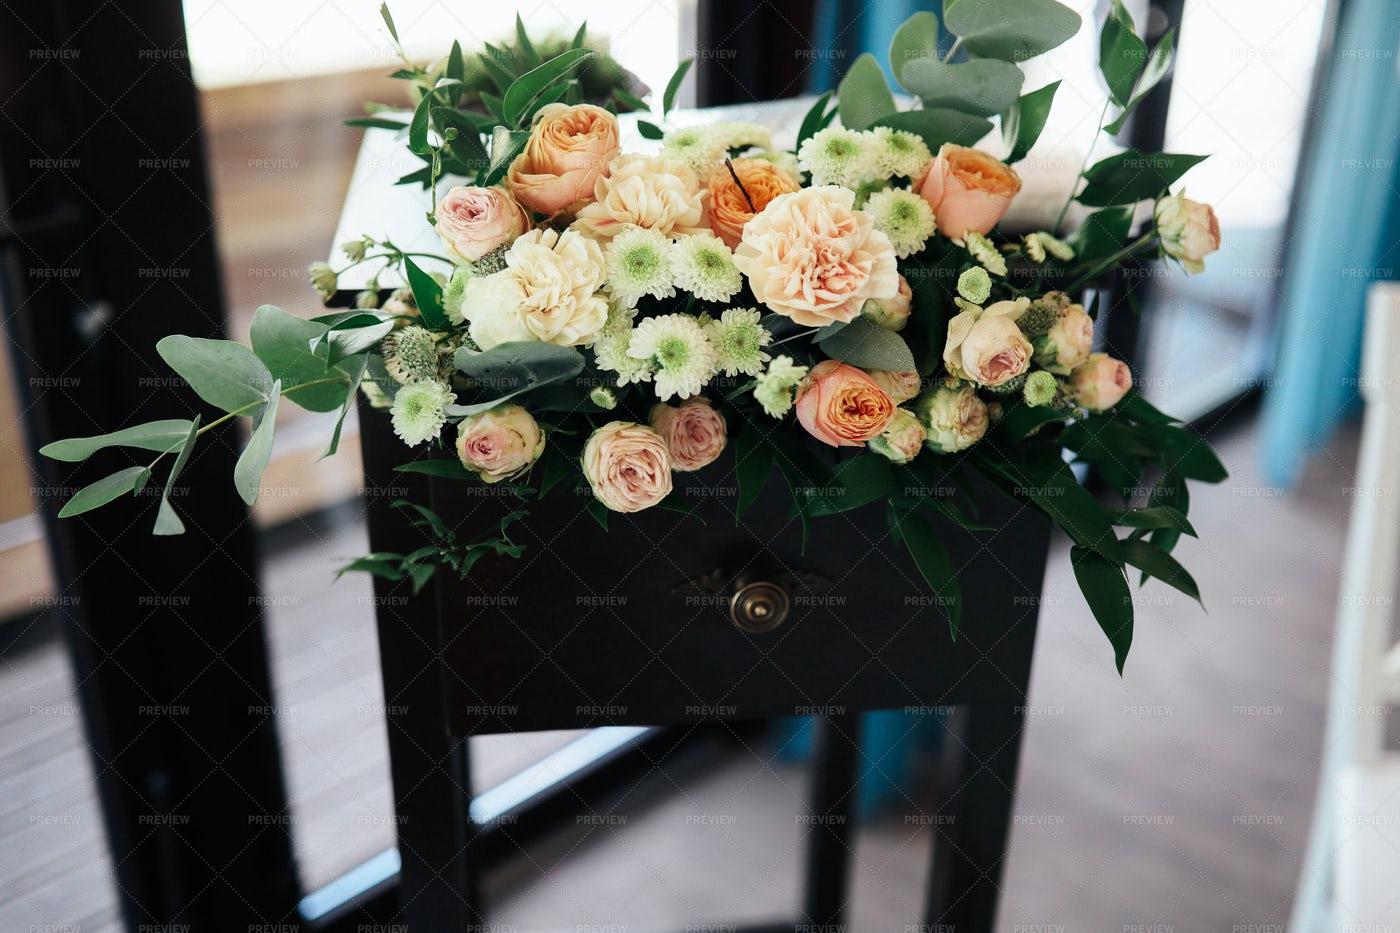 Bouquet On A Table: Stock Photos